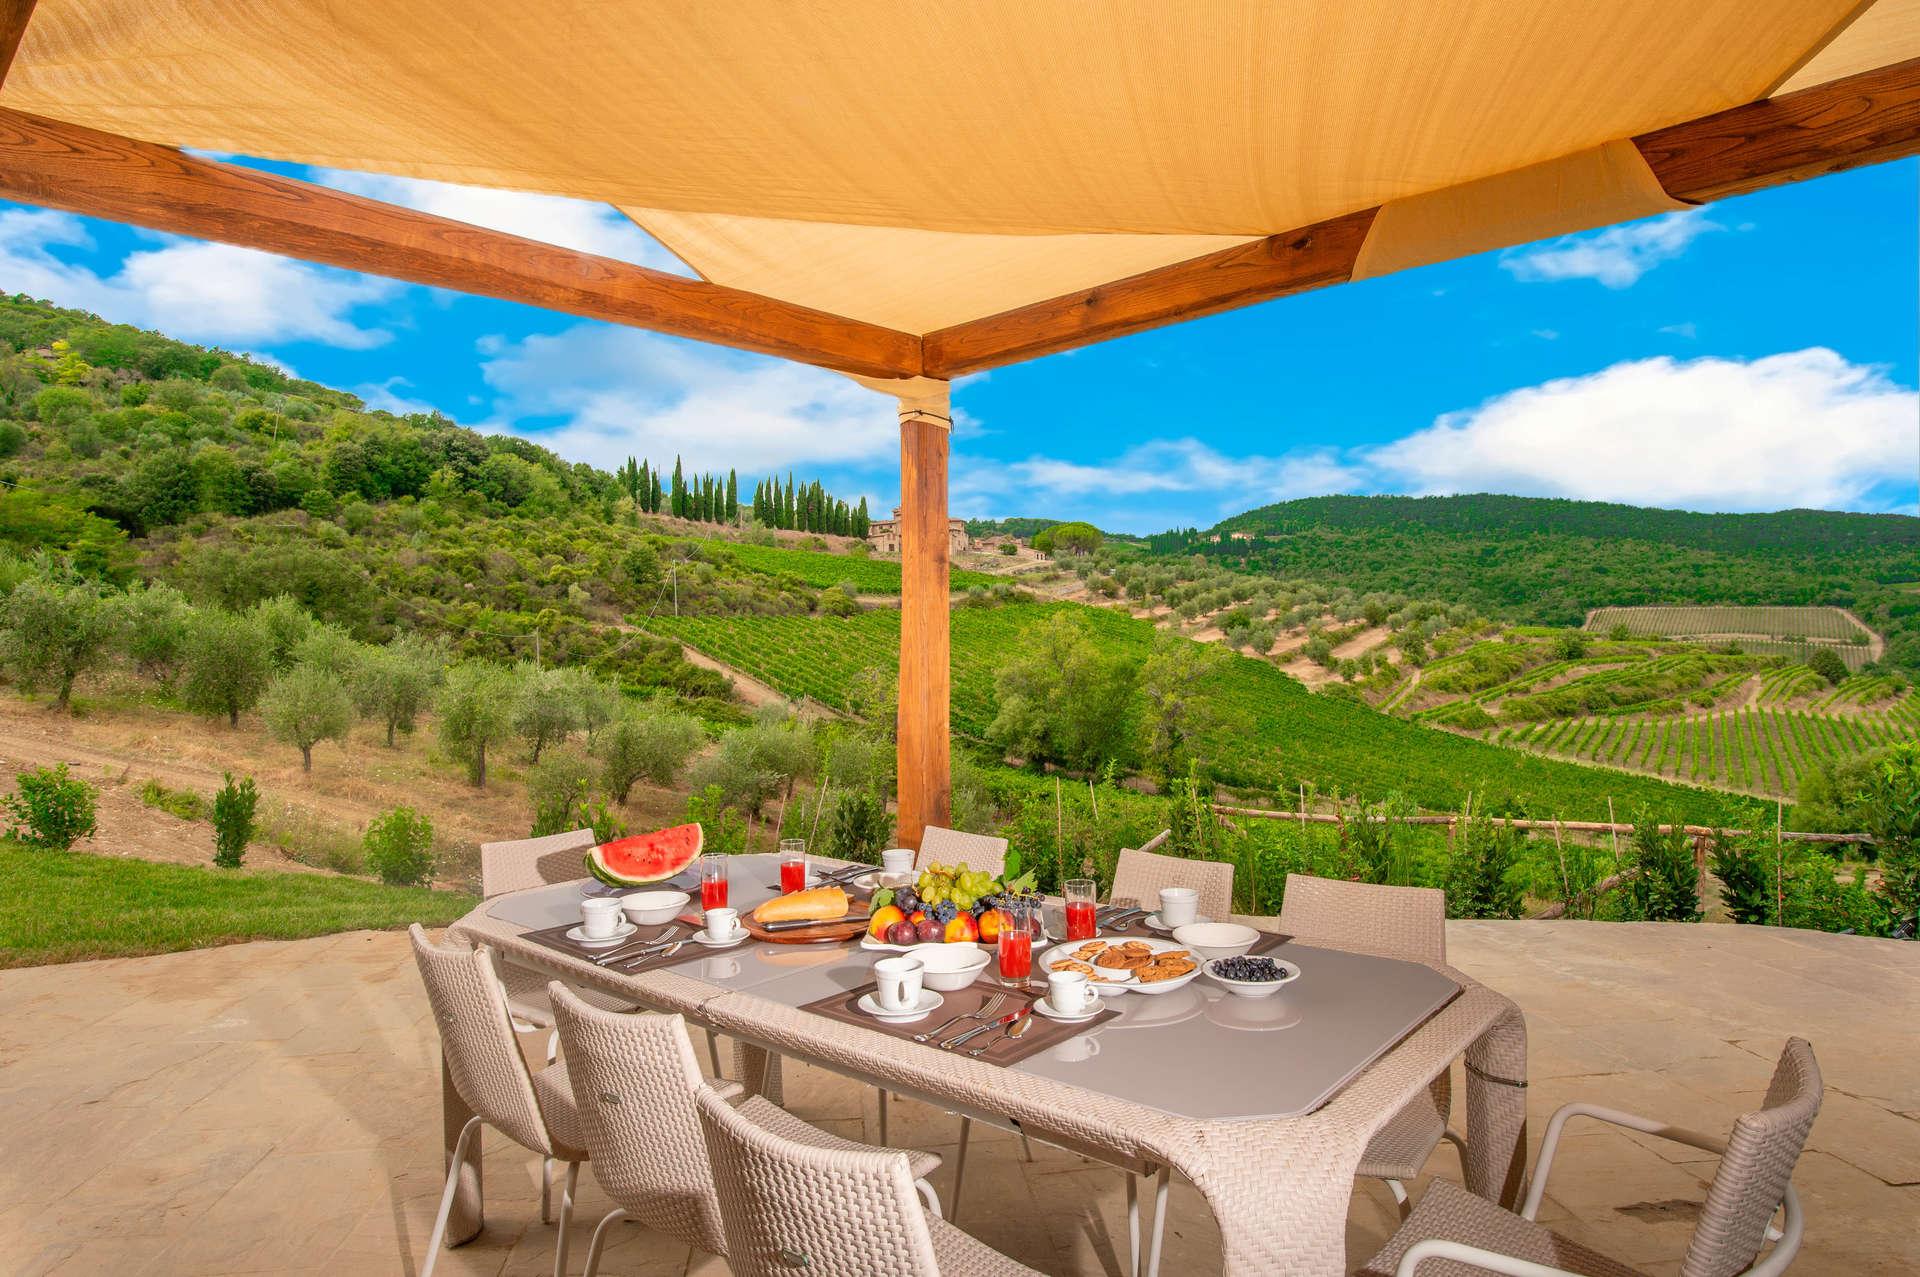 Luxury vacation rentals europe - Italy - Tuscany - Chia nti - Erinda - Image 1/14